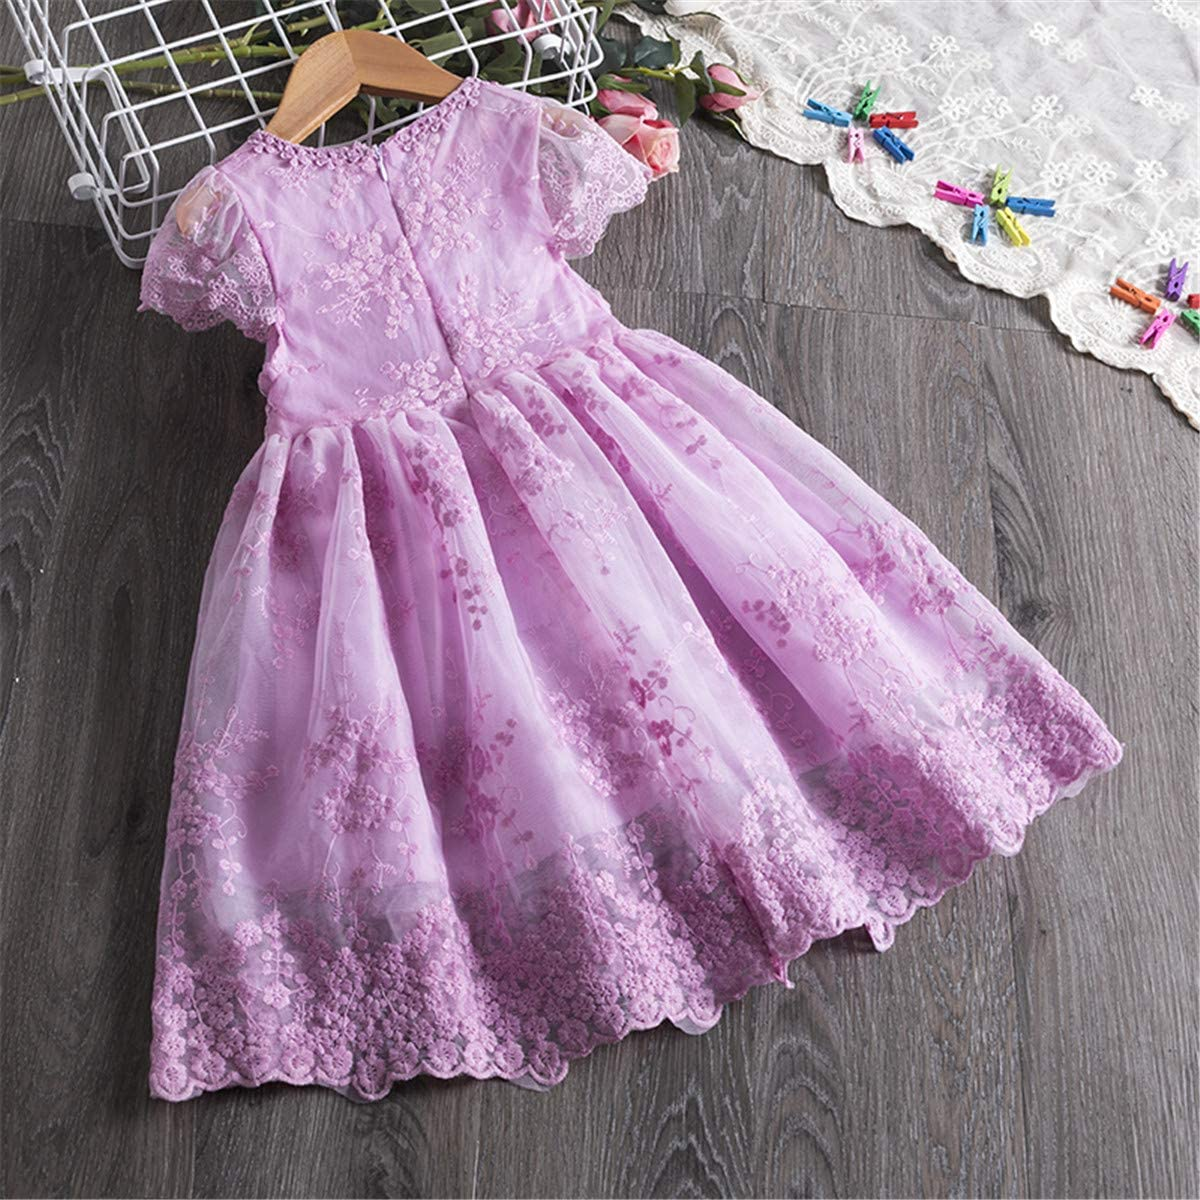 Girl's Unicorn Rainbow Dress Children Summer Casual Clothes